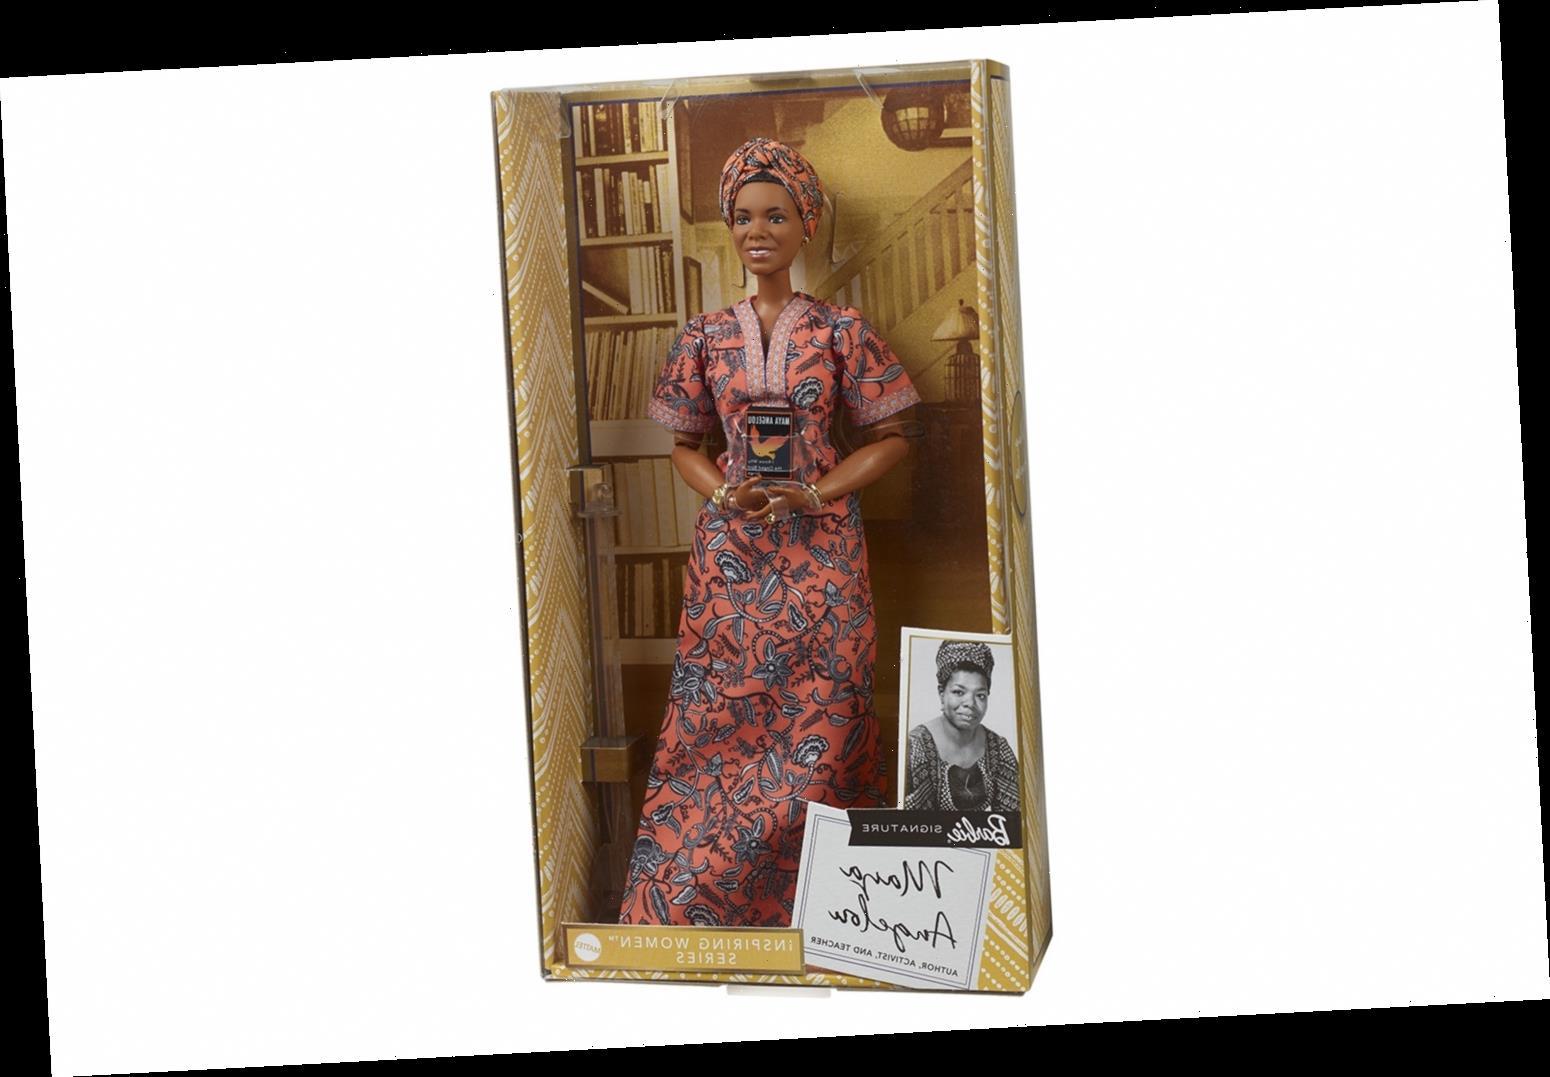 Mattel Unveils Barbie Doll Honoring Maya Angelou Ahead of Black History Month